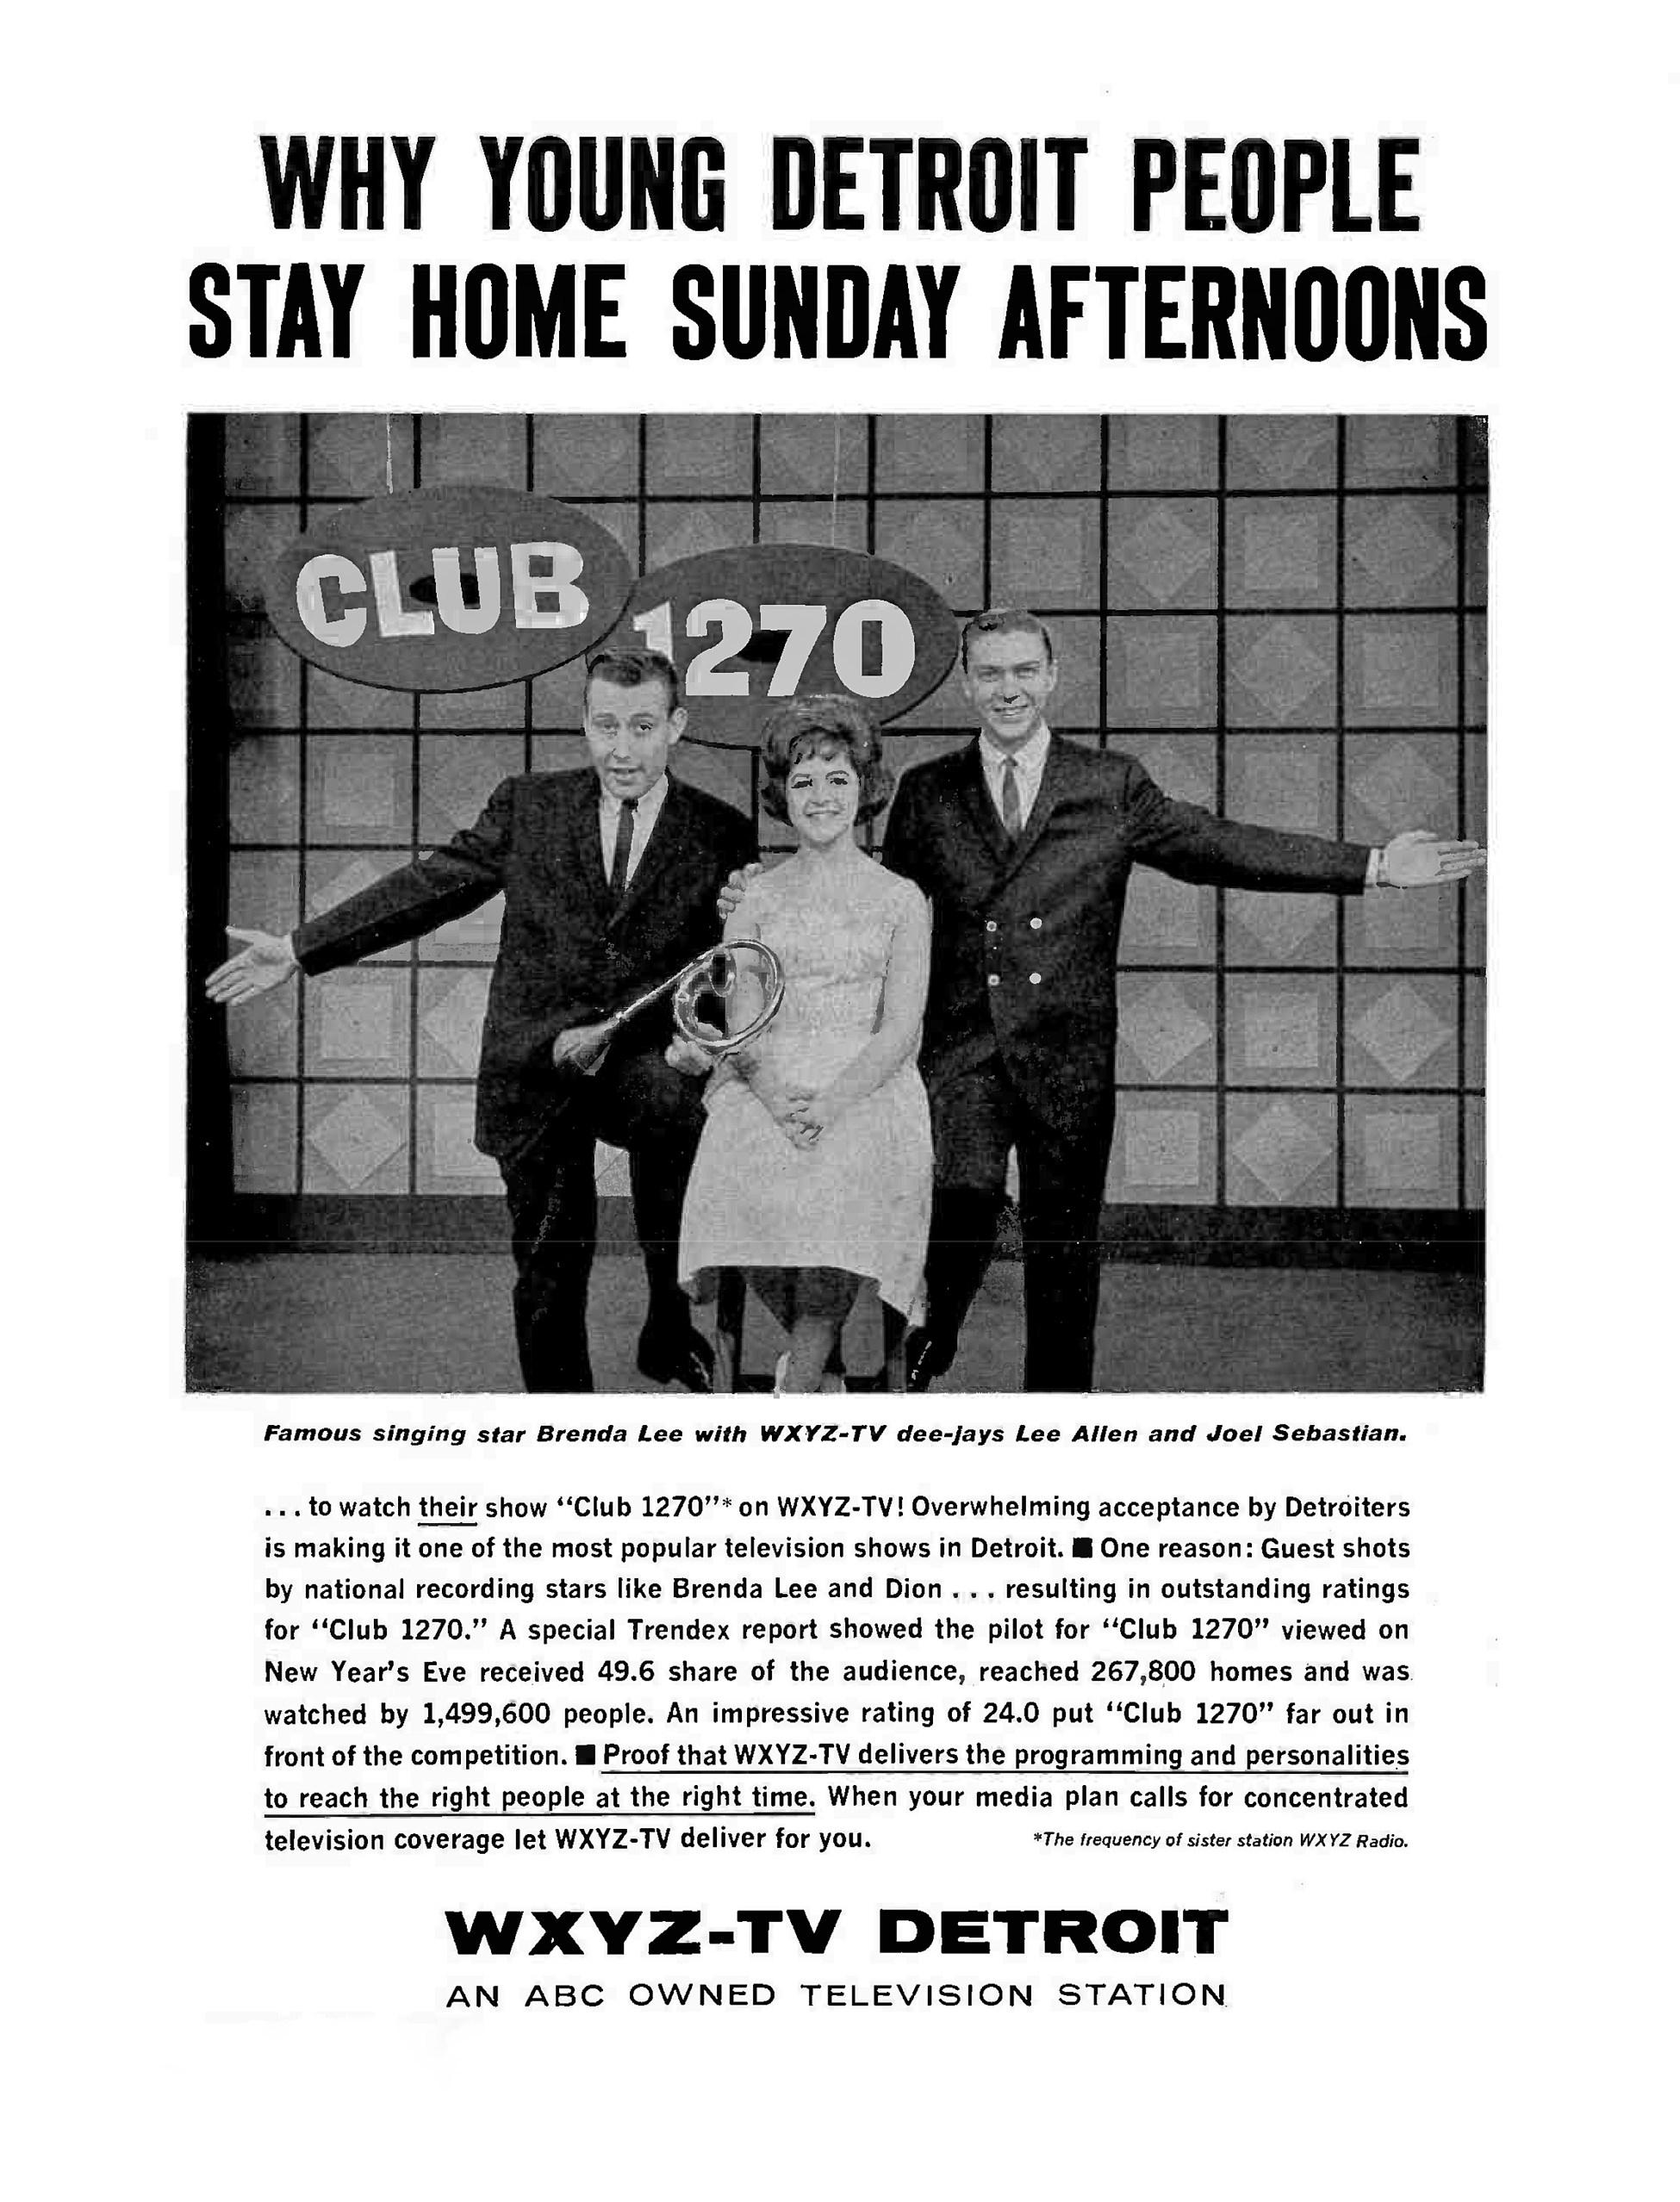 Club 1270